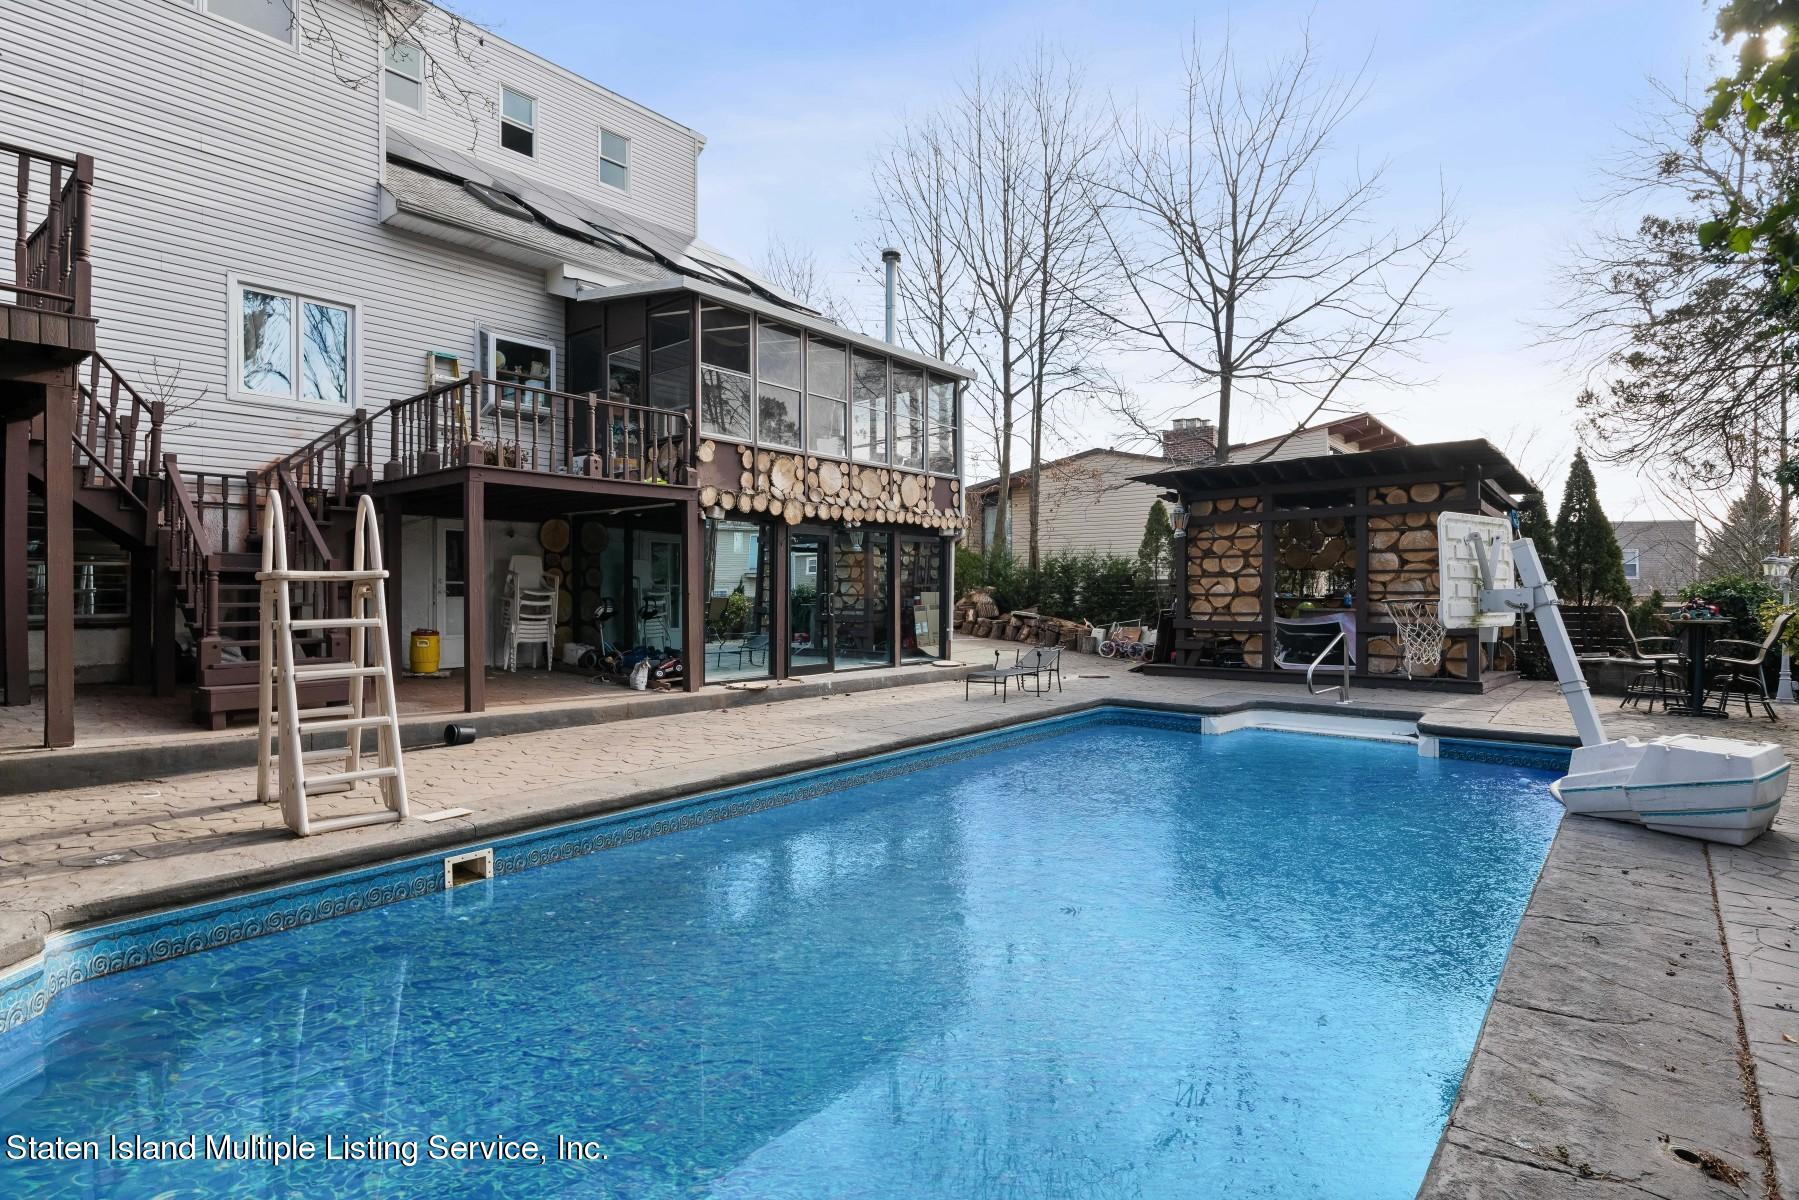 Single Family - Detached 8 Bionia Avenue  Staten Island, NY 10305, MLS-1142818-27